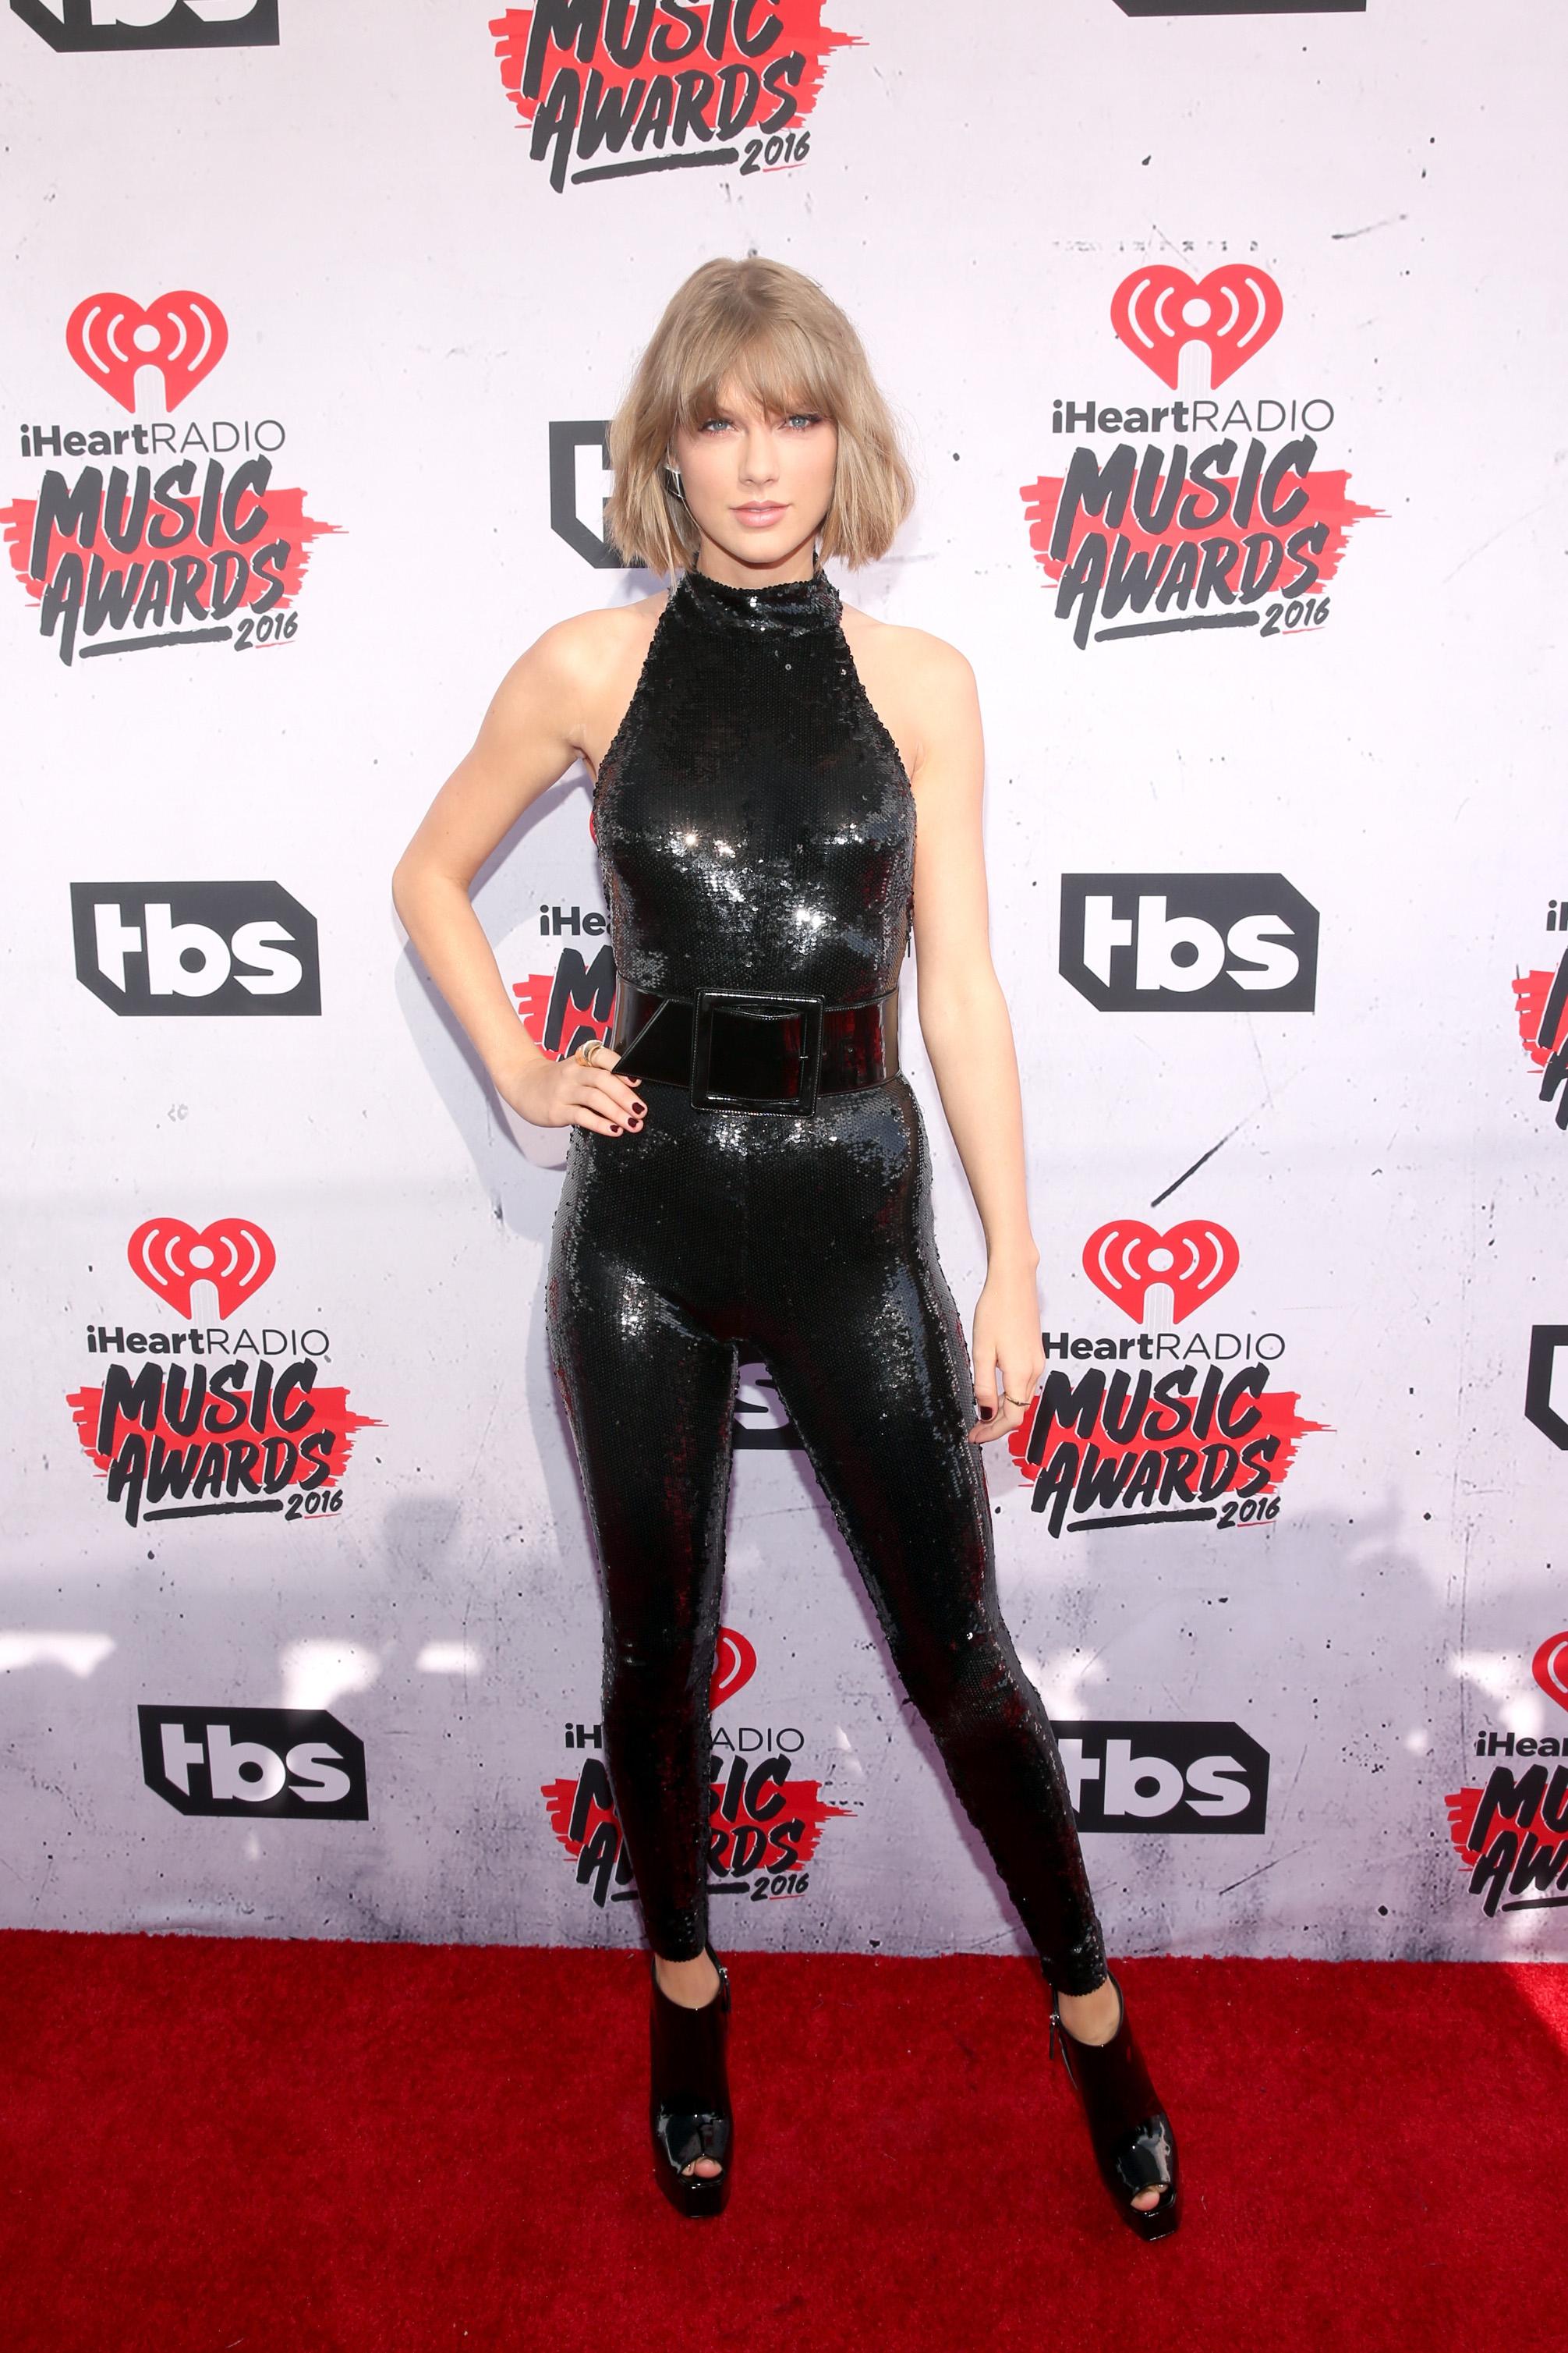 Taylor Swift starts renovations on $25M mansion